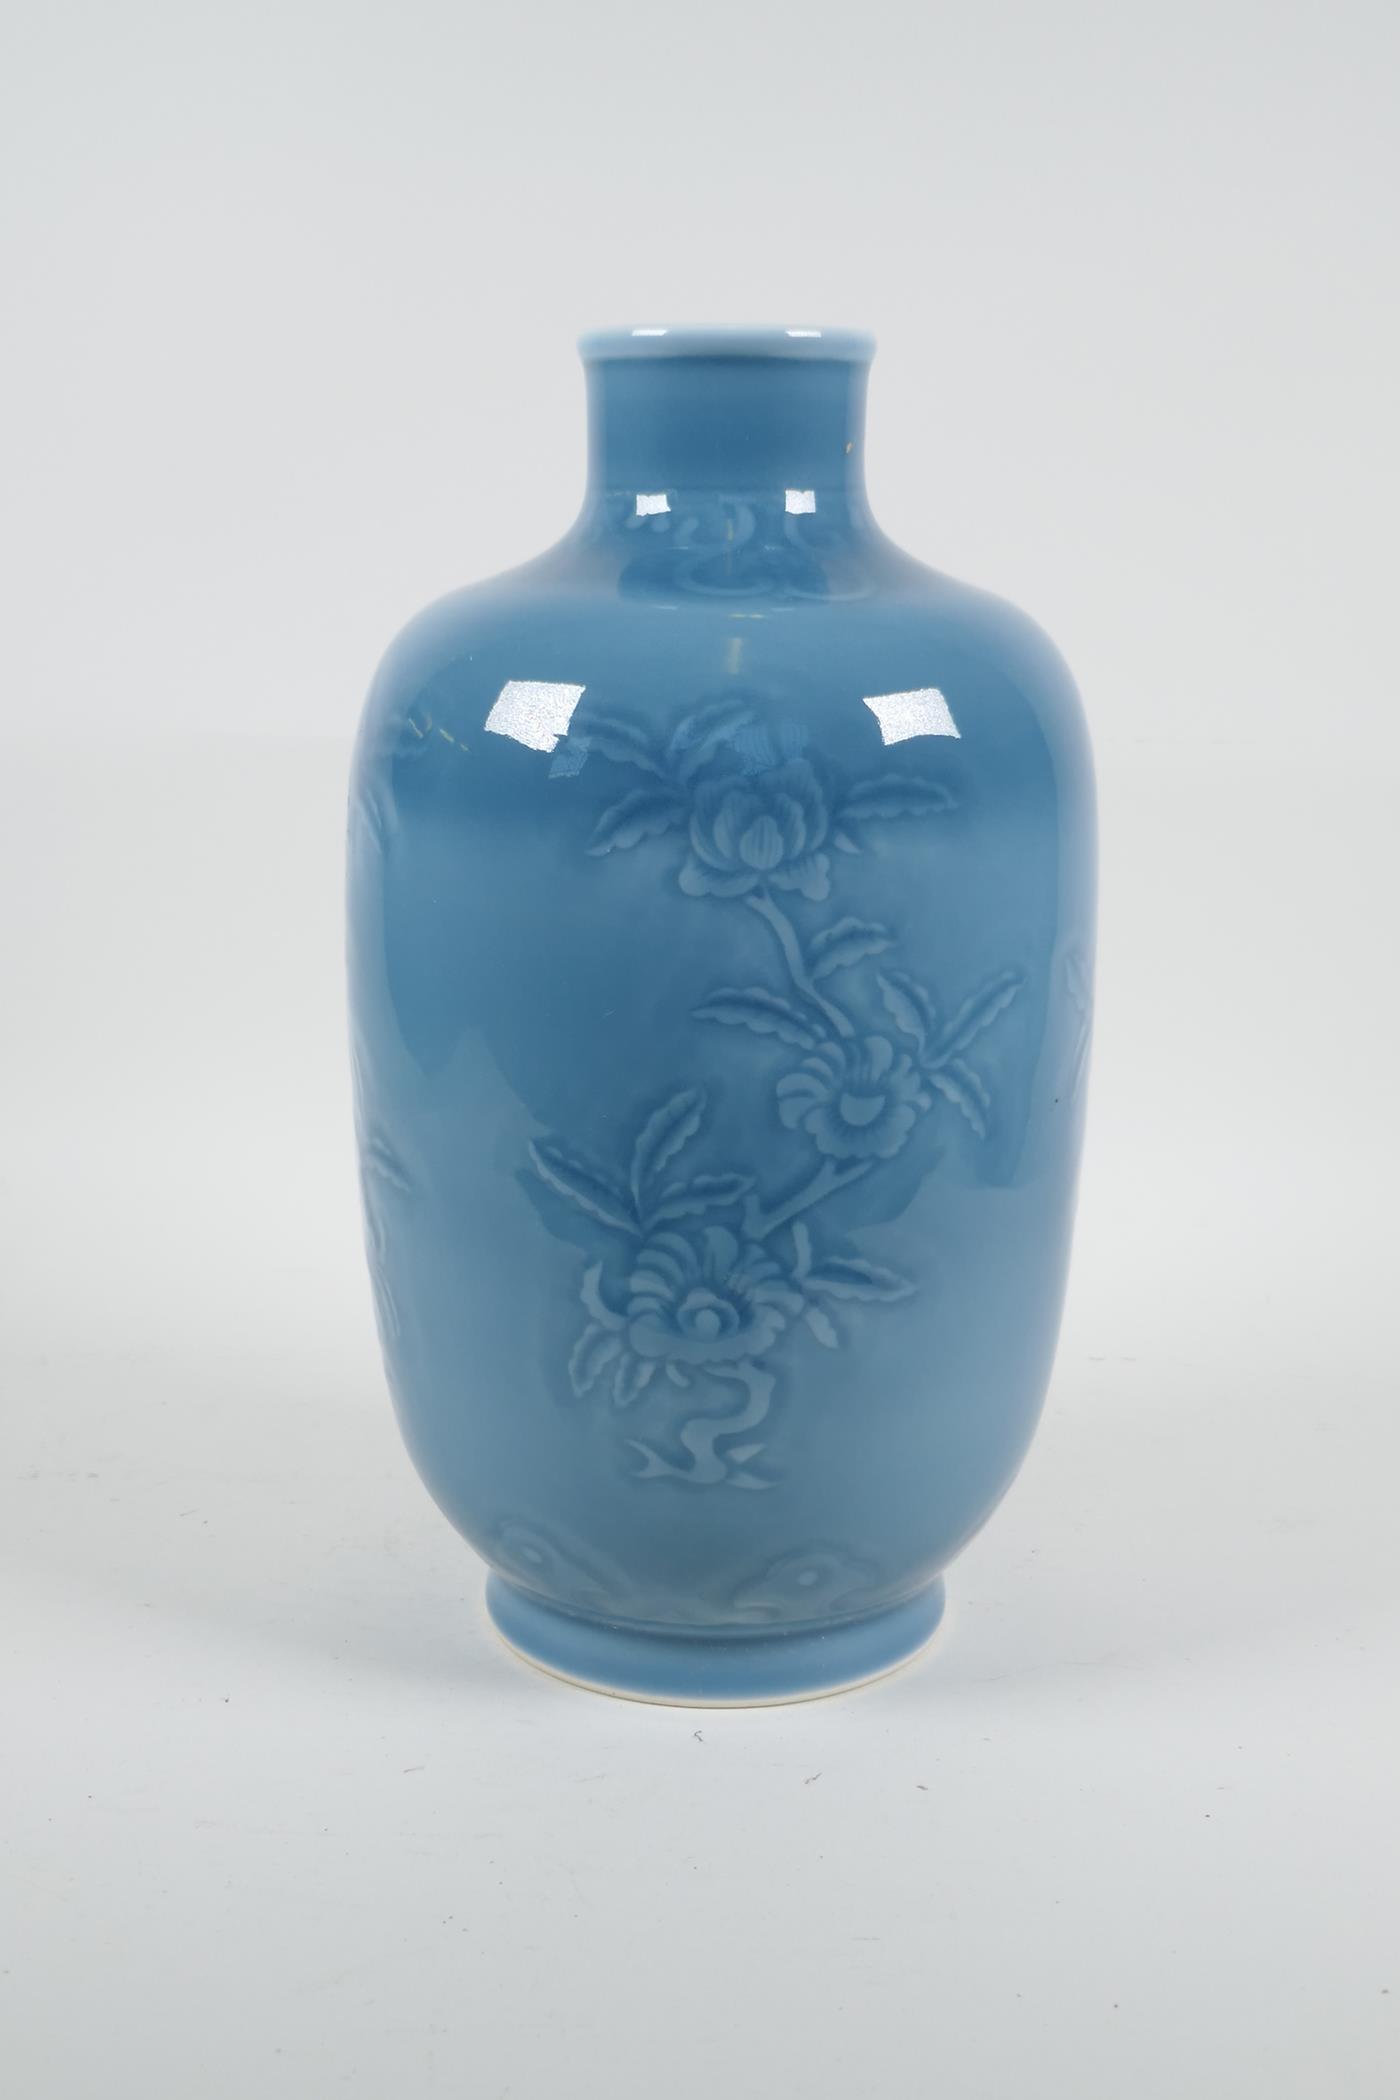 "A Chinese blue glazed porcelain vase with underglaze floral decoration, seal mark to base, 11"" high - Image 3 of 4"